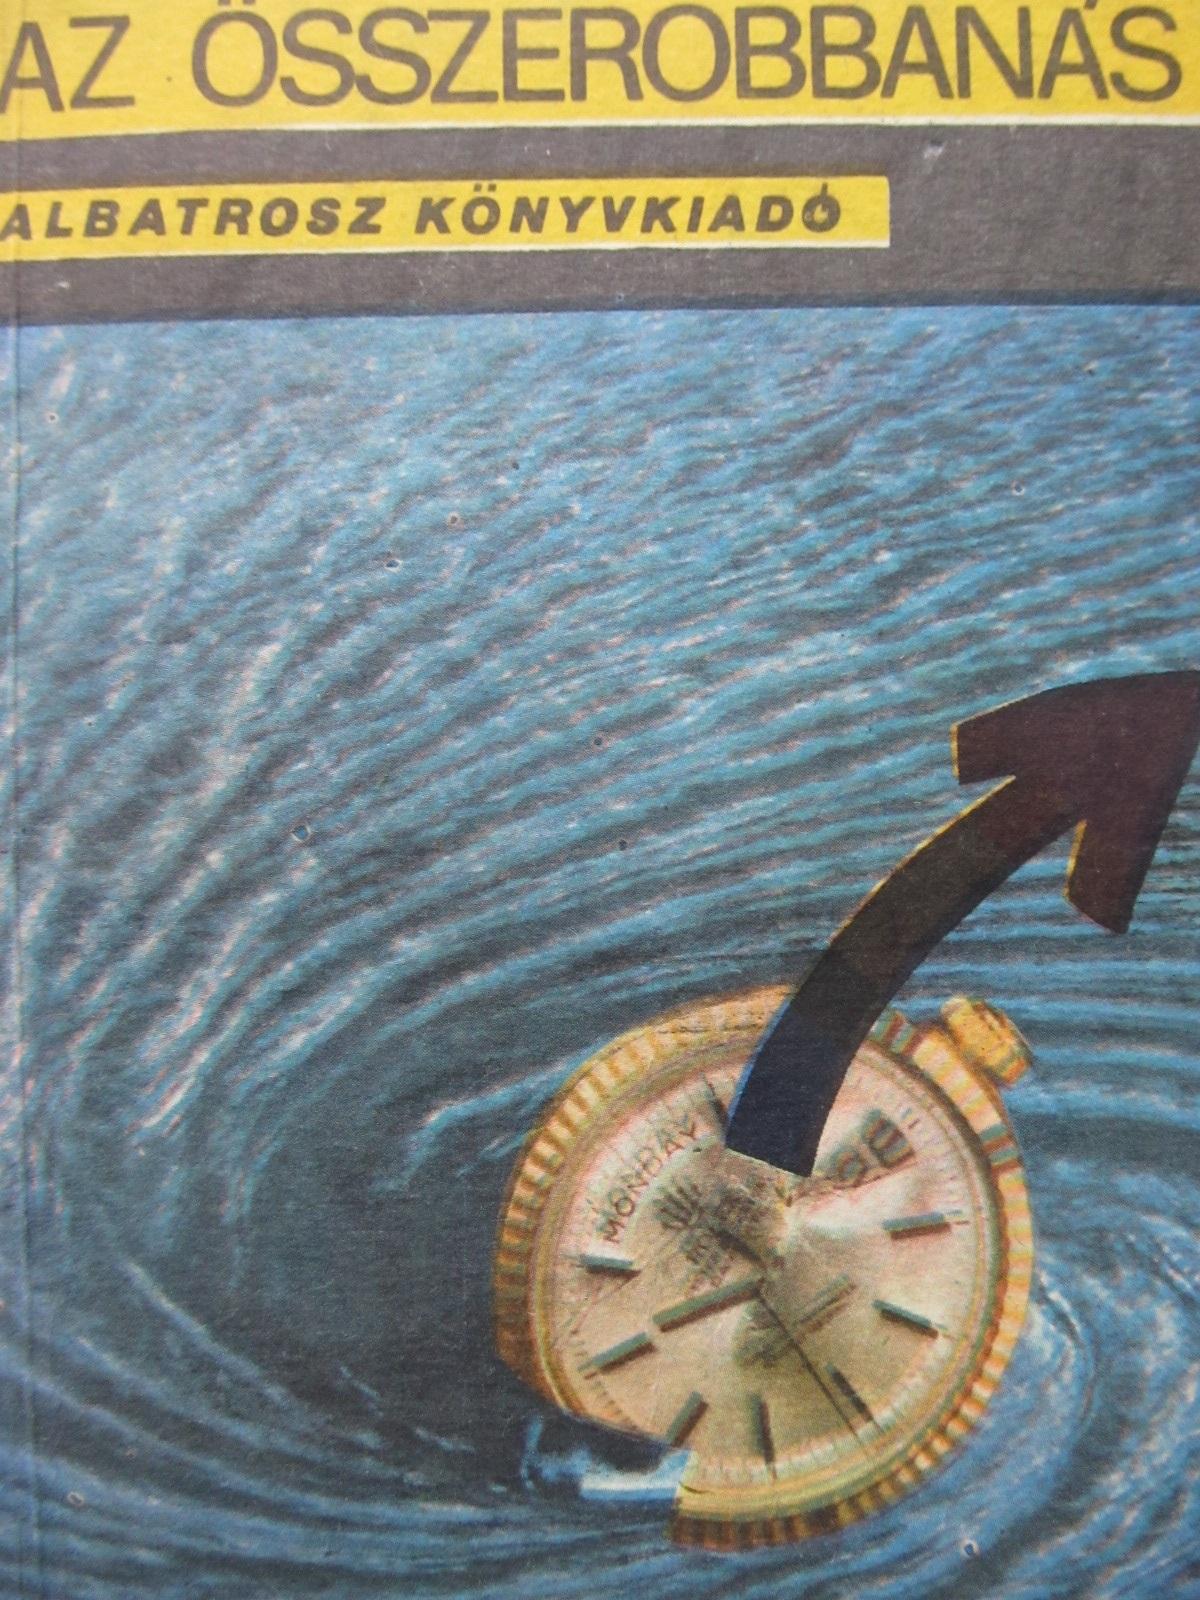 Az osszerobbanas Sci-fi gyujtemeny - H. G. Wells , Ray Bradbury , ... | Detalii carte